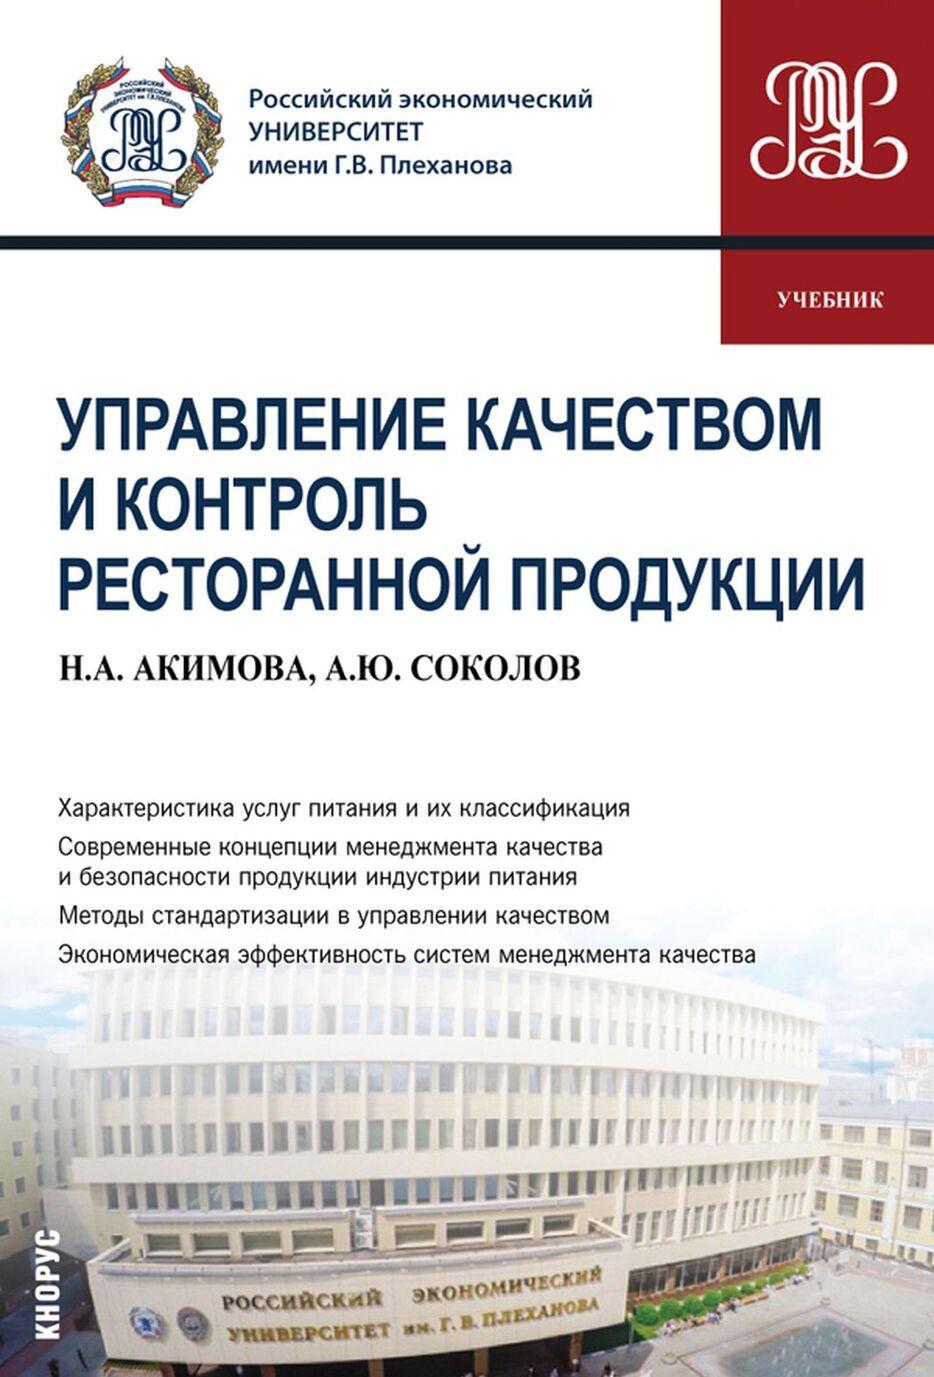 Upravlenie kachestvom i kontrol restorannoj produktsii. Uchebnik | Akimova Natalja Anatolevna, Sokolov Aleksandr Jurevich